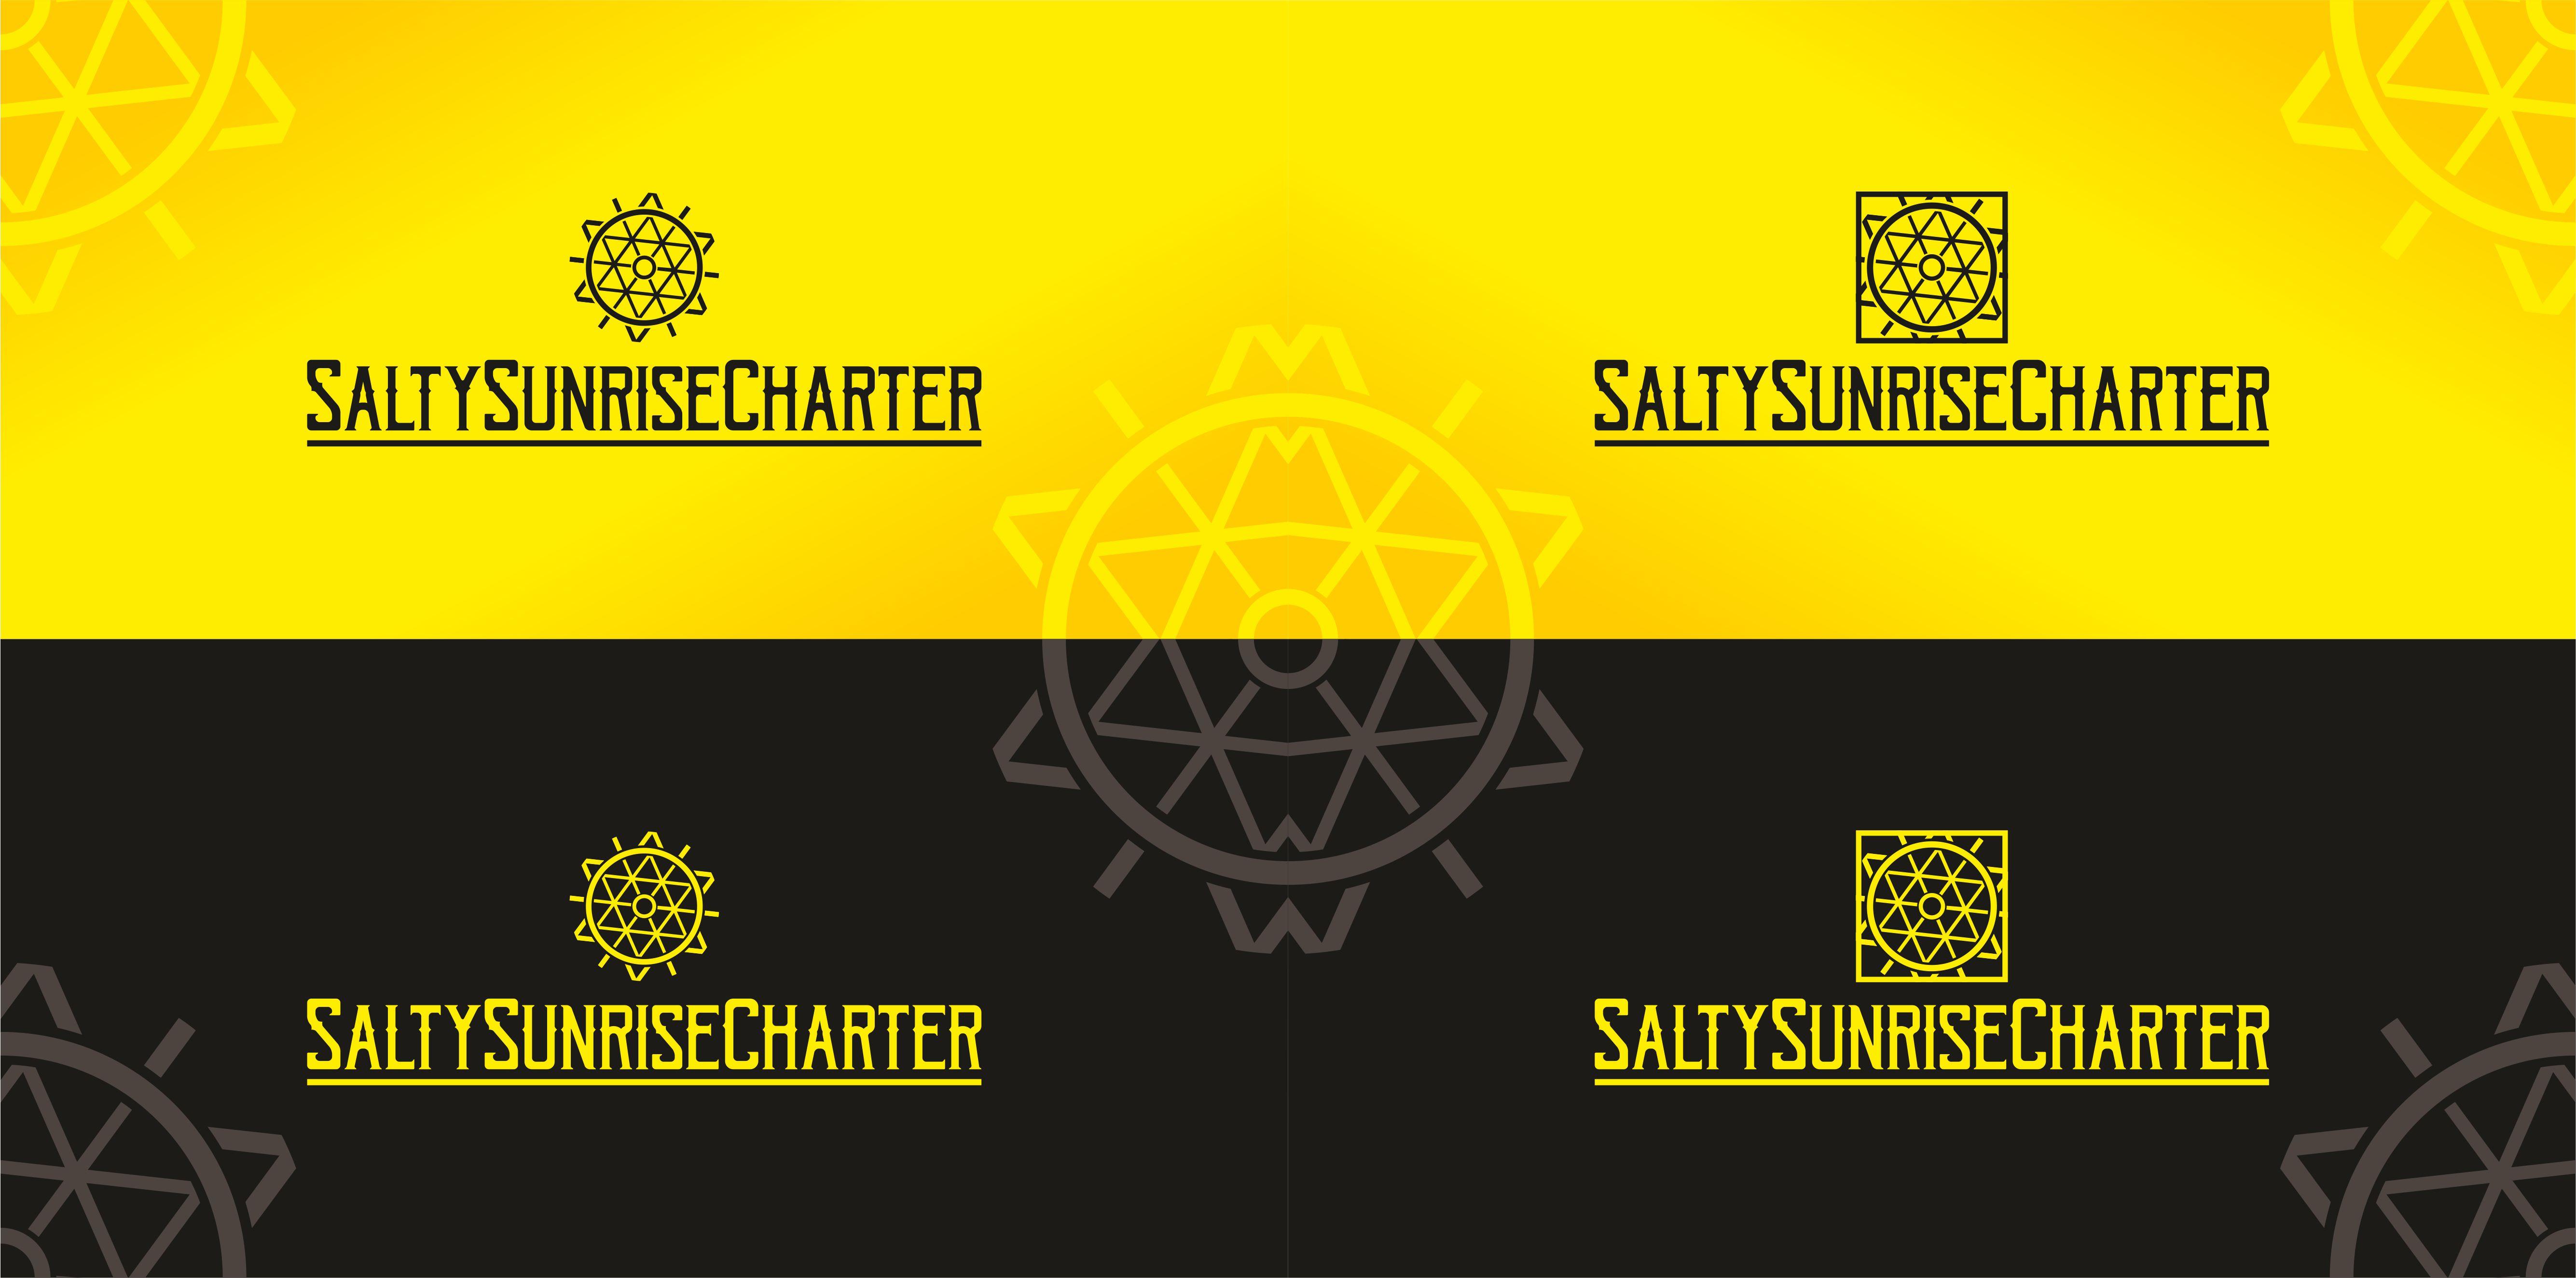 Разработка логотипа и наименования для чартерной компании  фото f_3285a93ed3cb5c1f.jpg